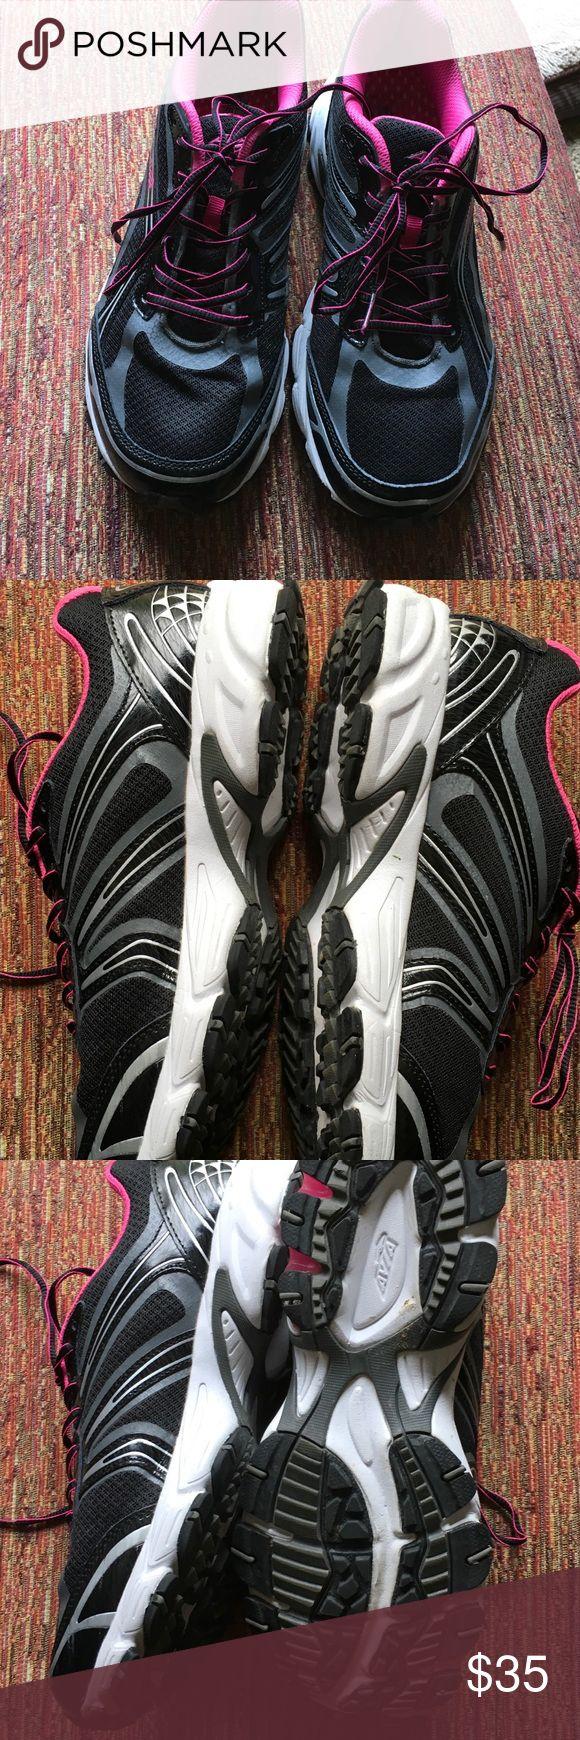 Avia sneakers, worn once. Black and grey mesh, pink lining.  Medium width.  042707 Avia Shoes Sneakers